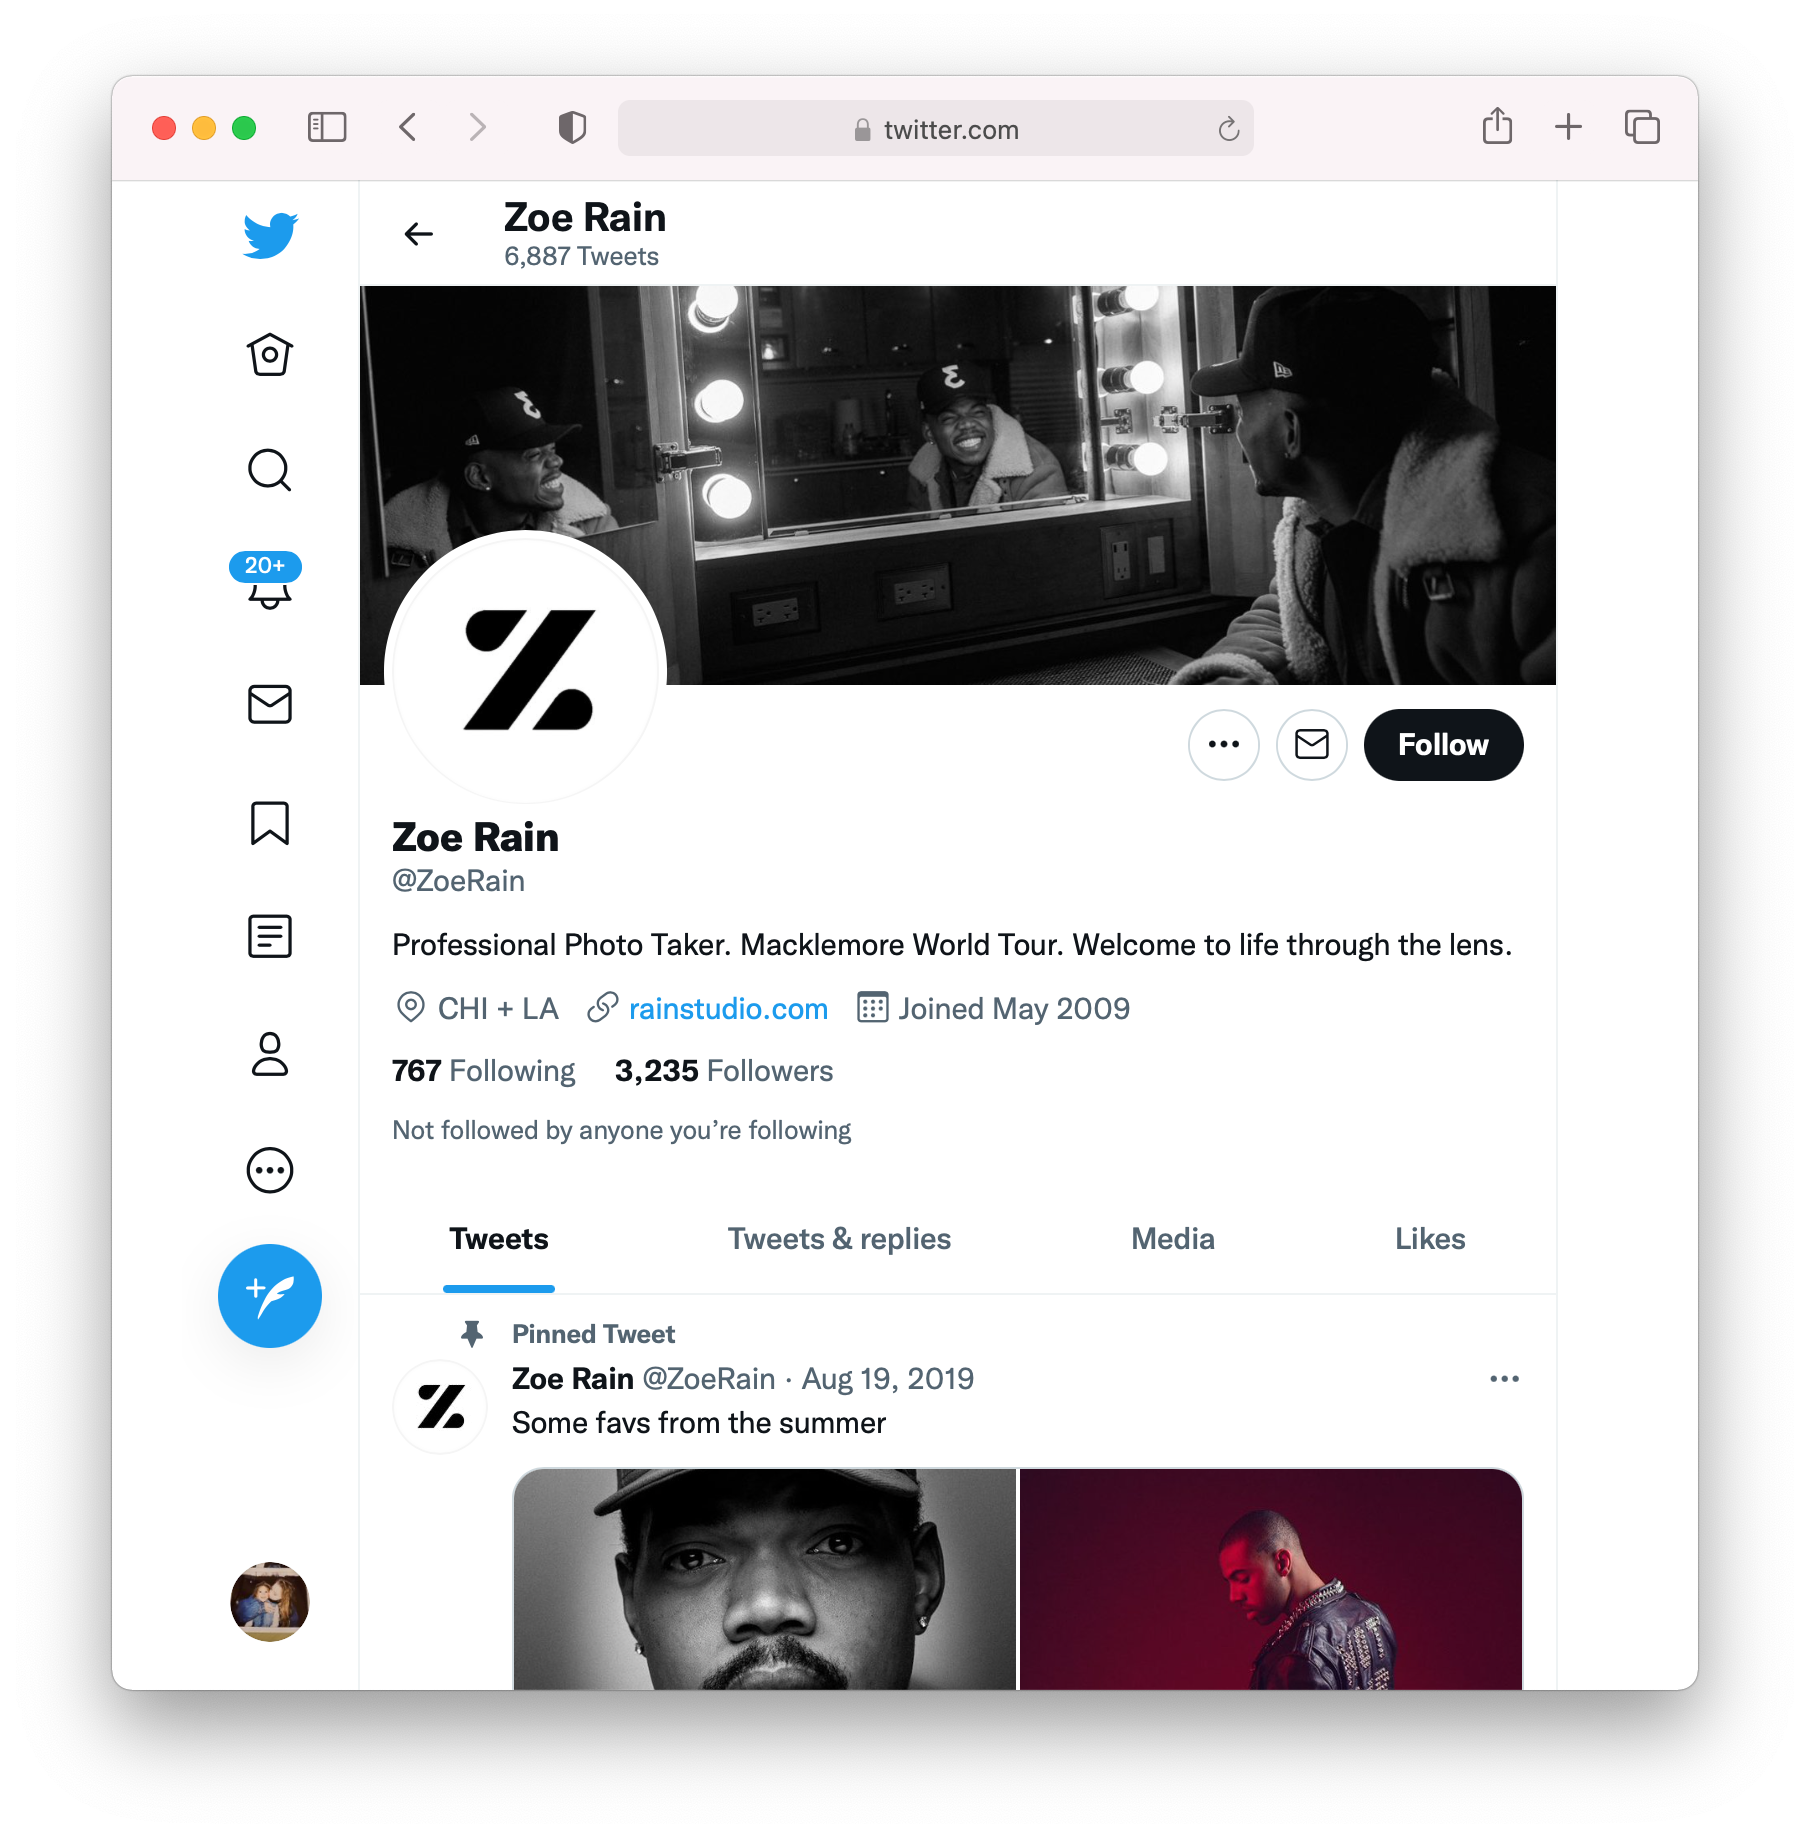 Screenshot of Zoe Rain's Twitter feed.